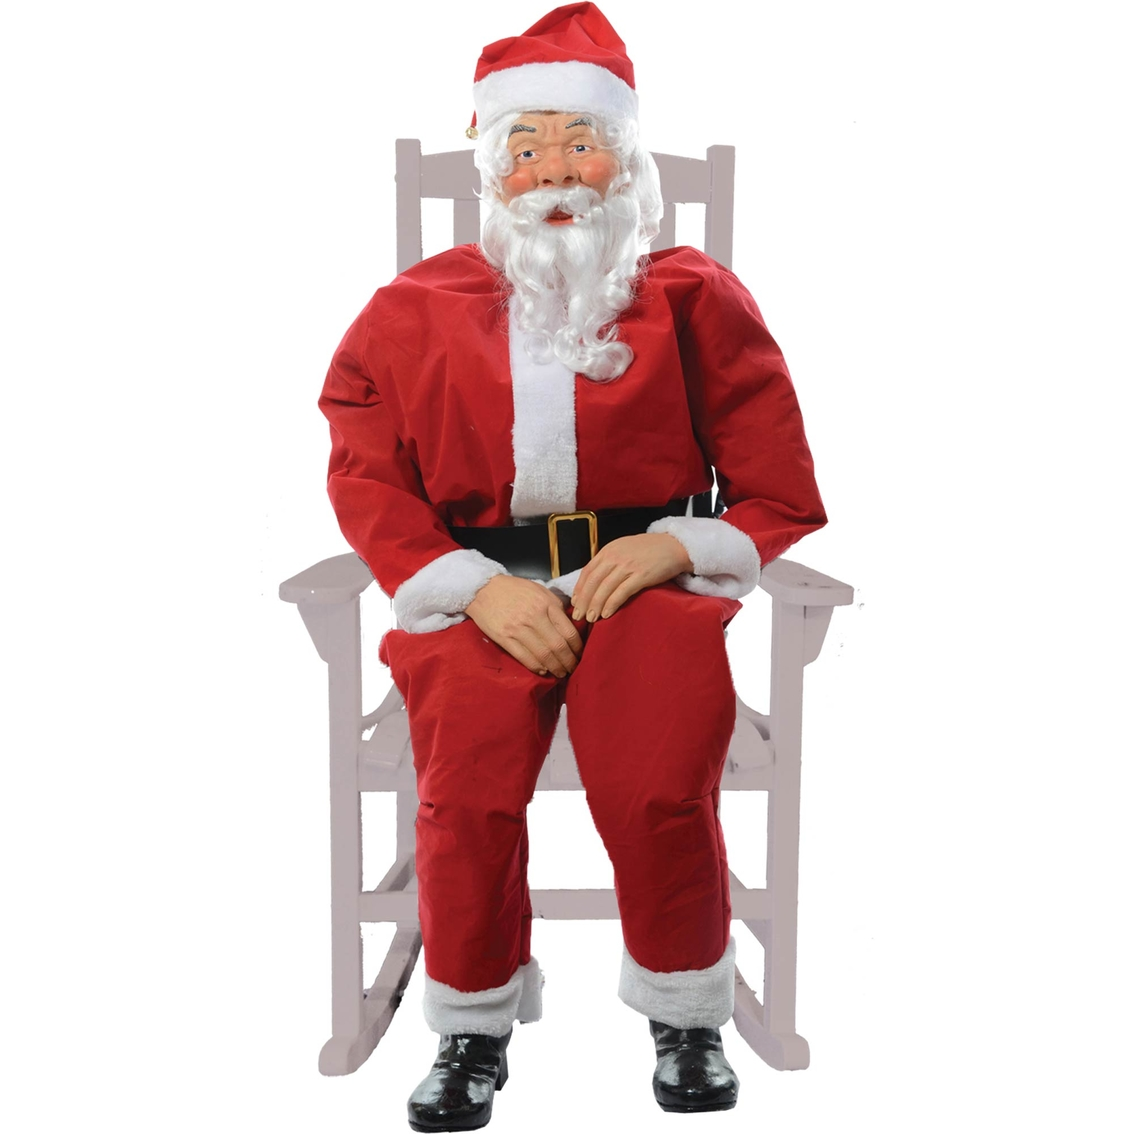 CHRISTMAS ANIMATED LIFE SIZE SANTA INDOOR OUTDOOR PORCH DECORATION W// SENSOR PAD